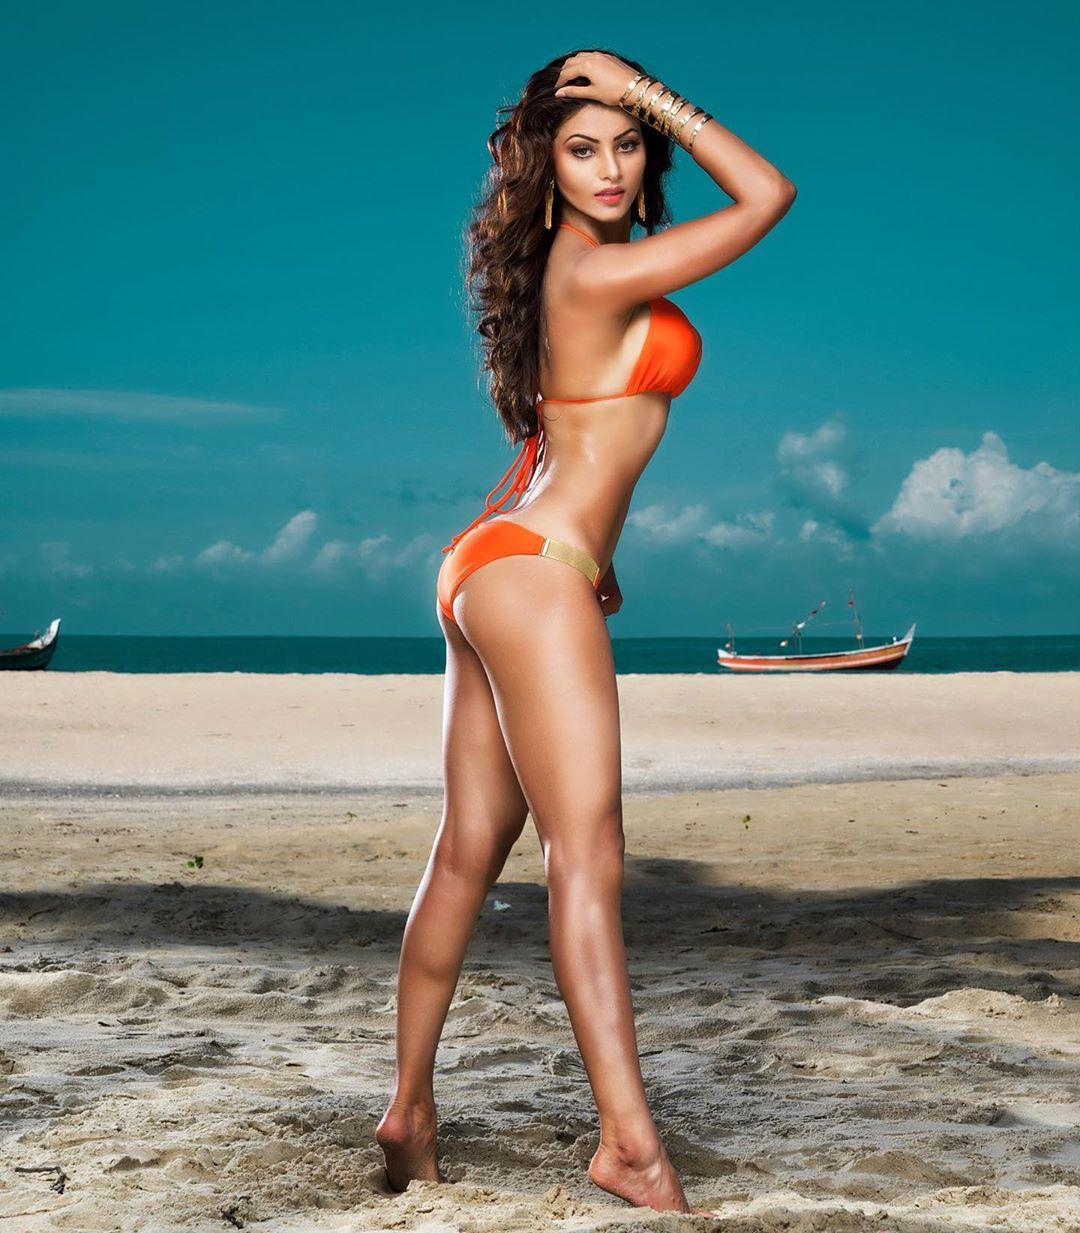 urvashi-rautela-poses-in-a-bikini-on-the-seaside-beach